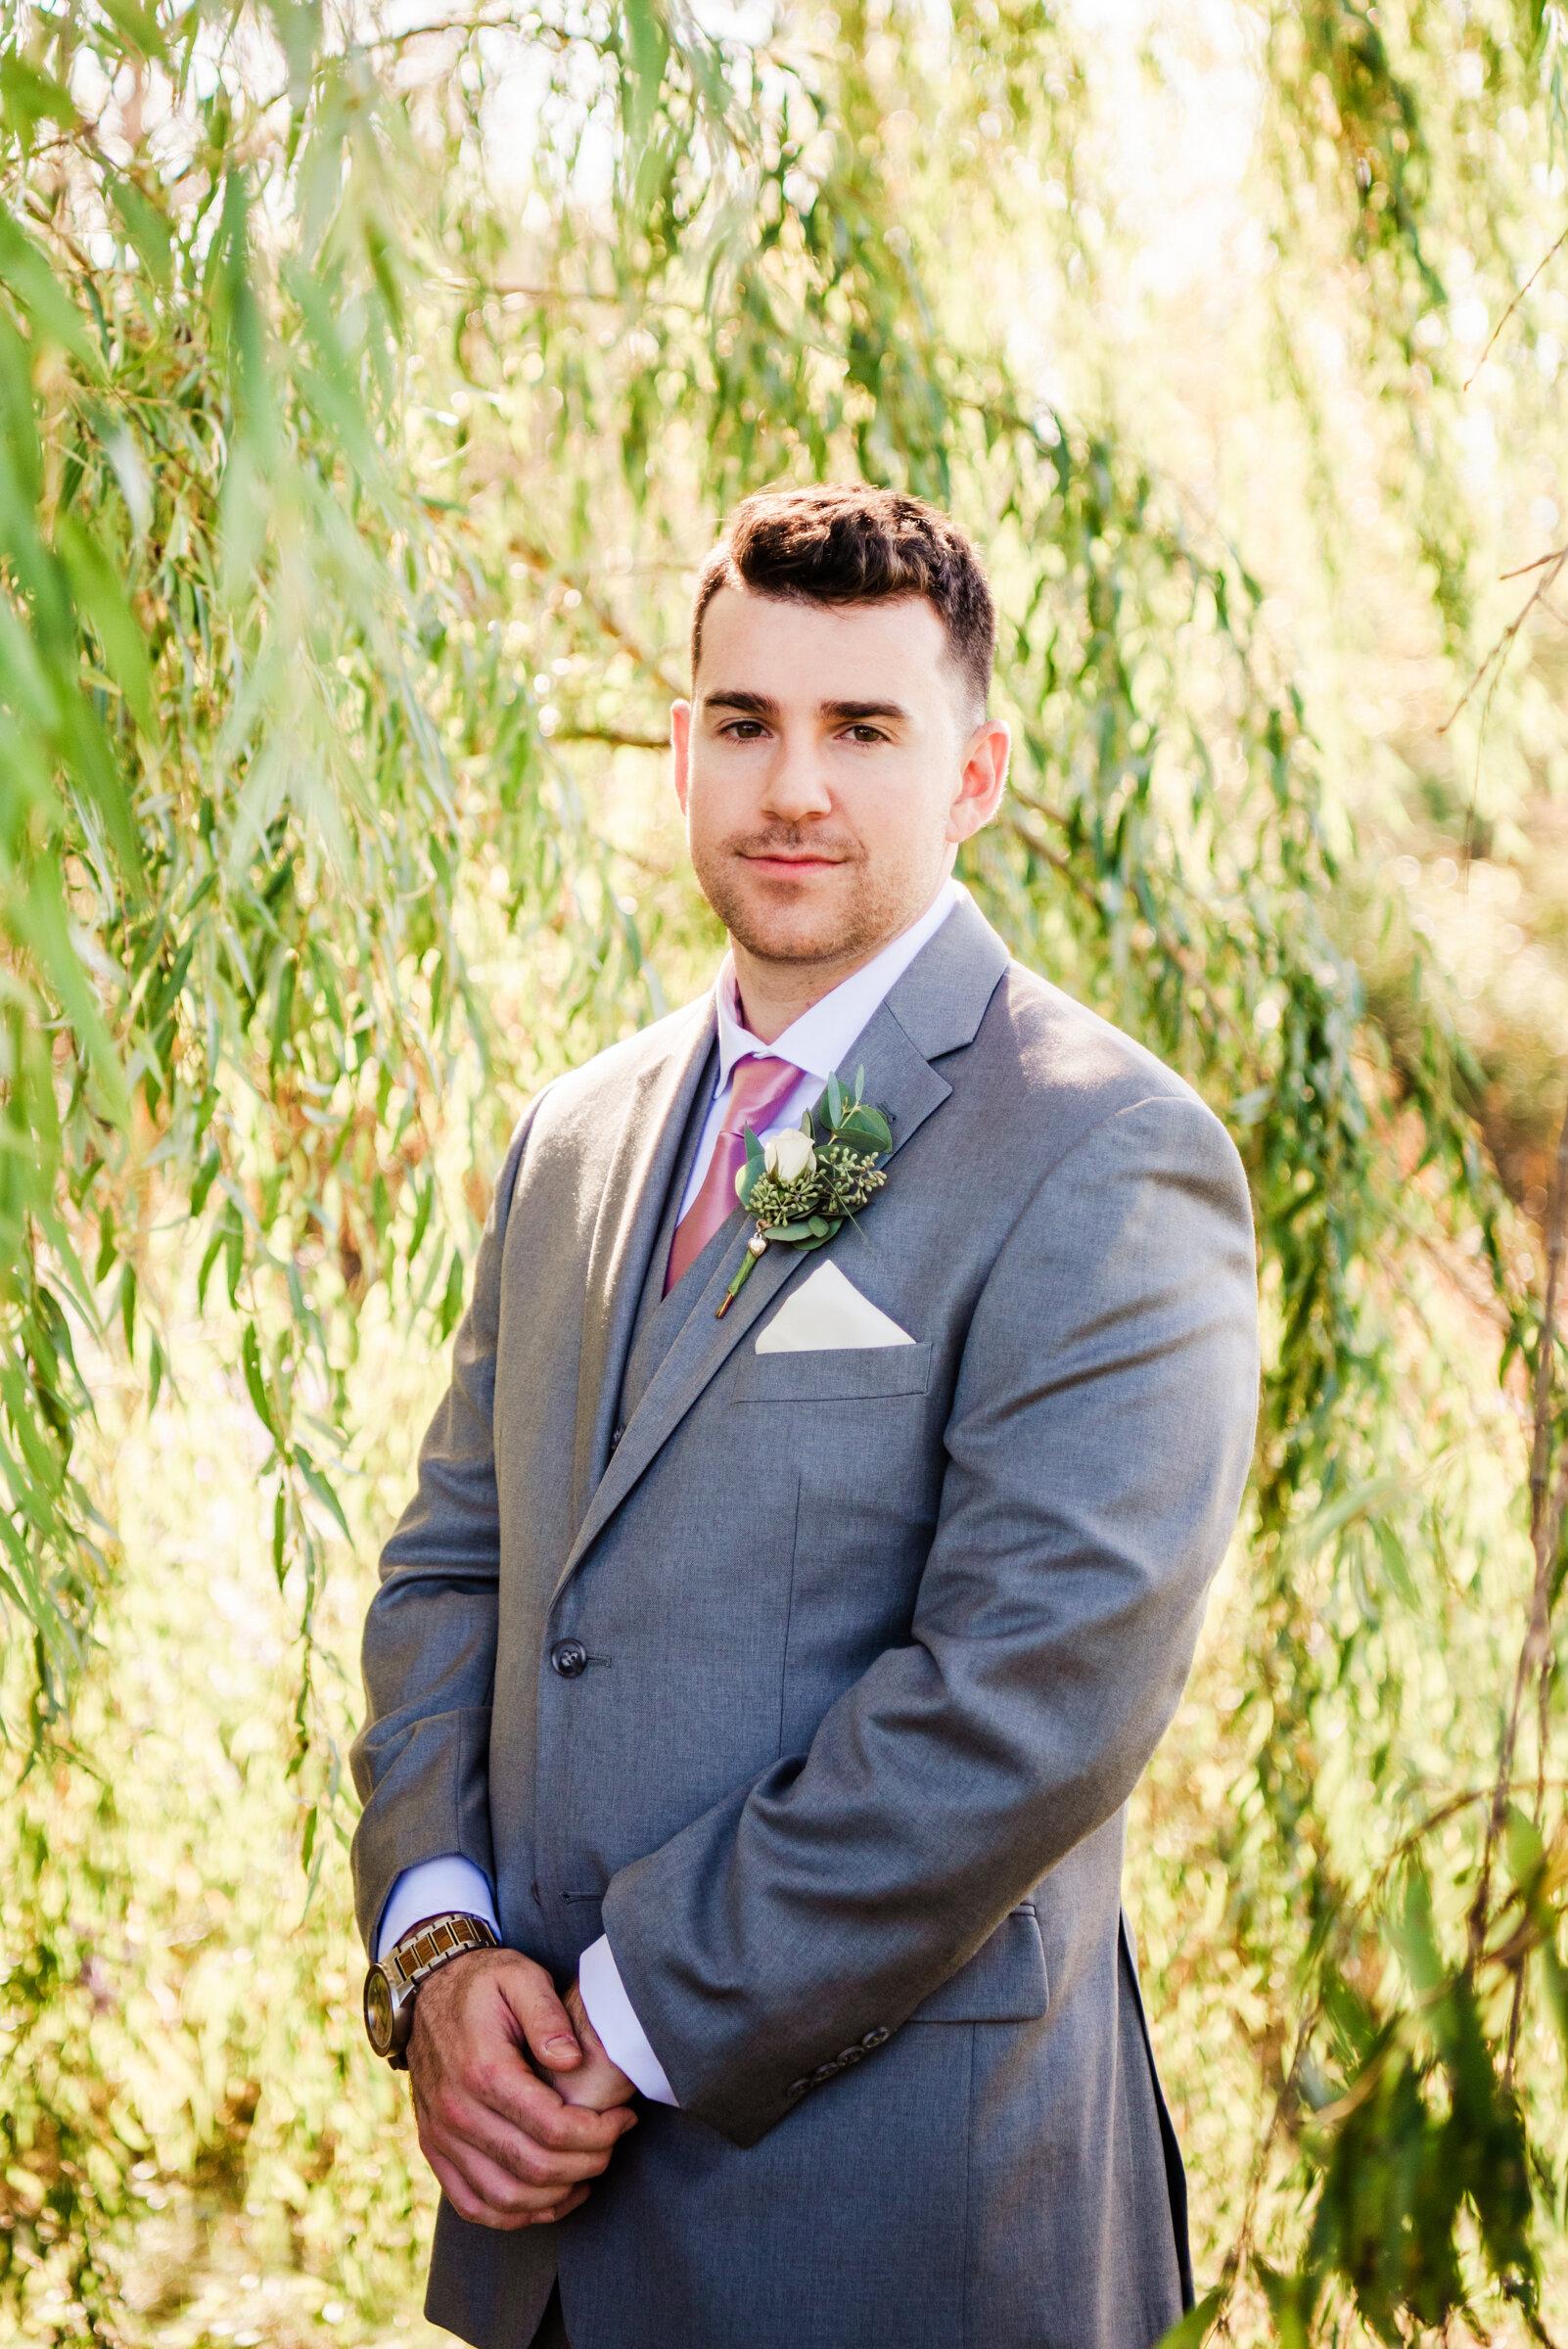 Deerfield_Country_Club_Rochester_Wedding_JILL_STUDIO_Rochester_NY_Photographer_DSC_6446.jpg